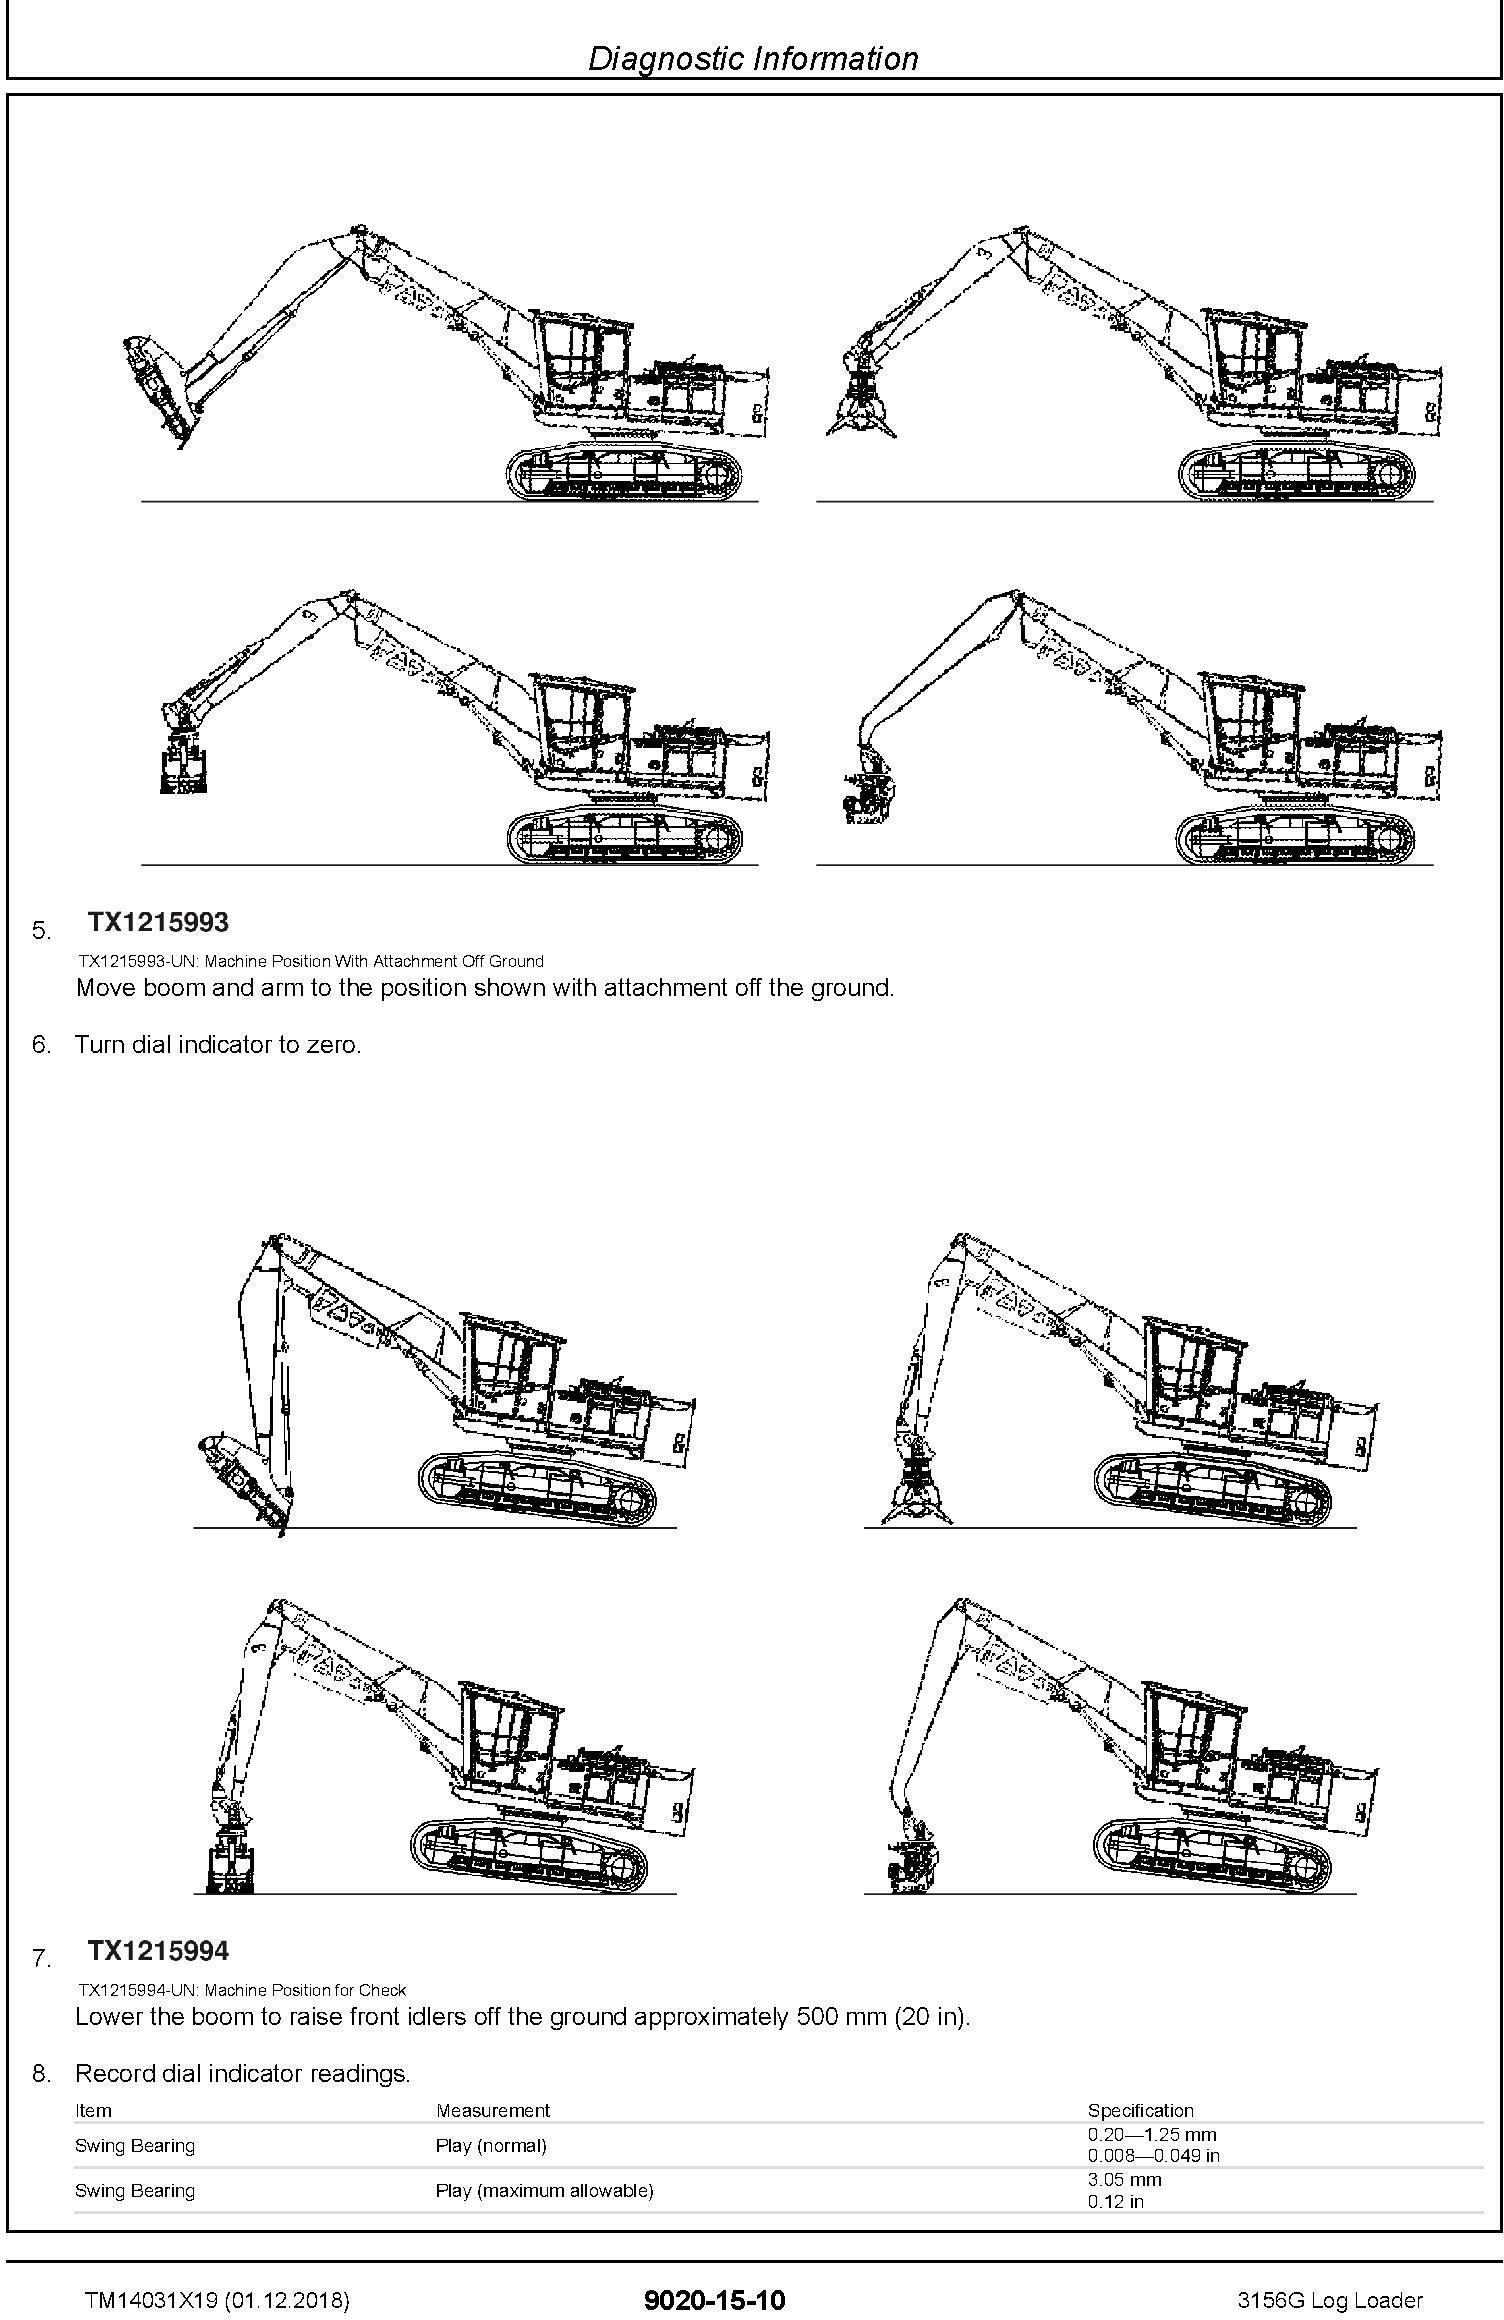 John Deere 3156G (SN. D316001-) Log Loader Operation & Test Technical Service Manual (TM14031X19) - 1